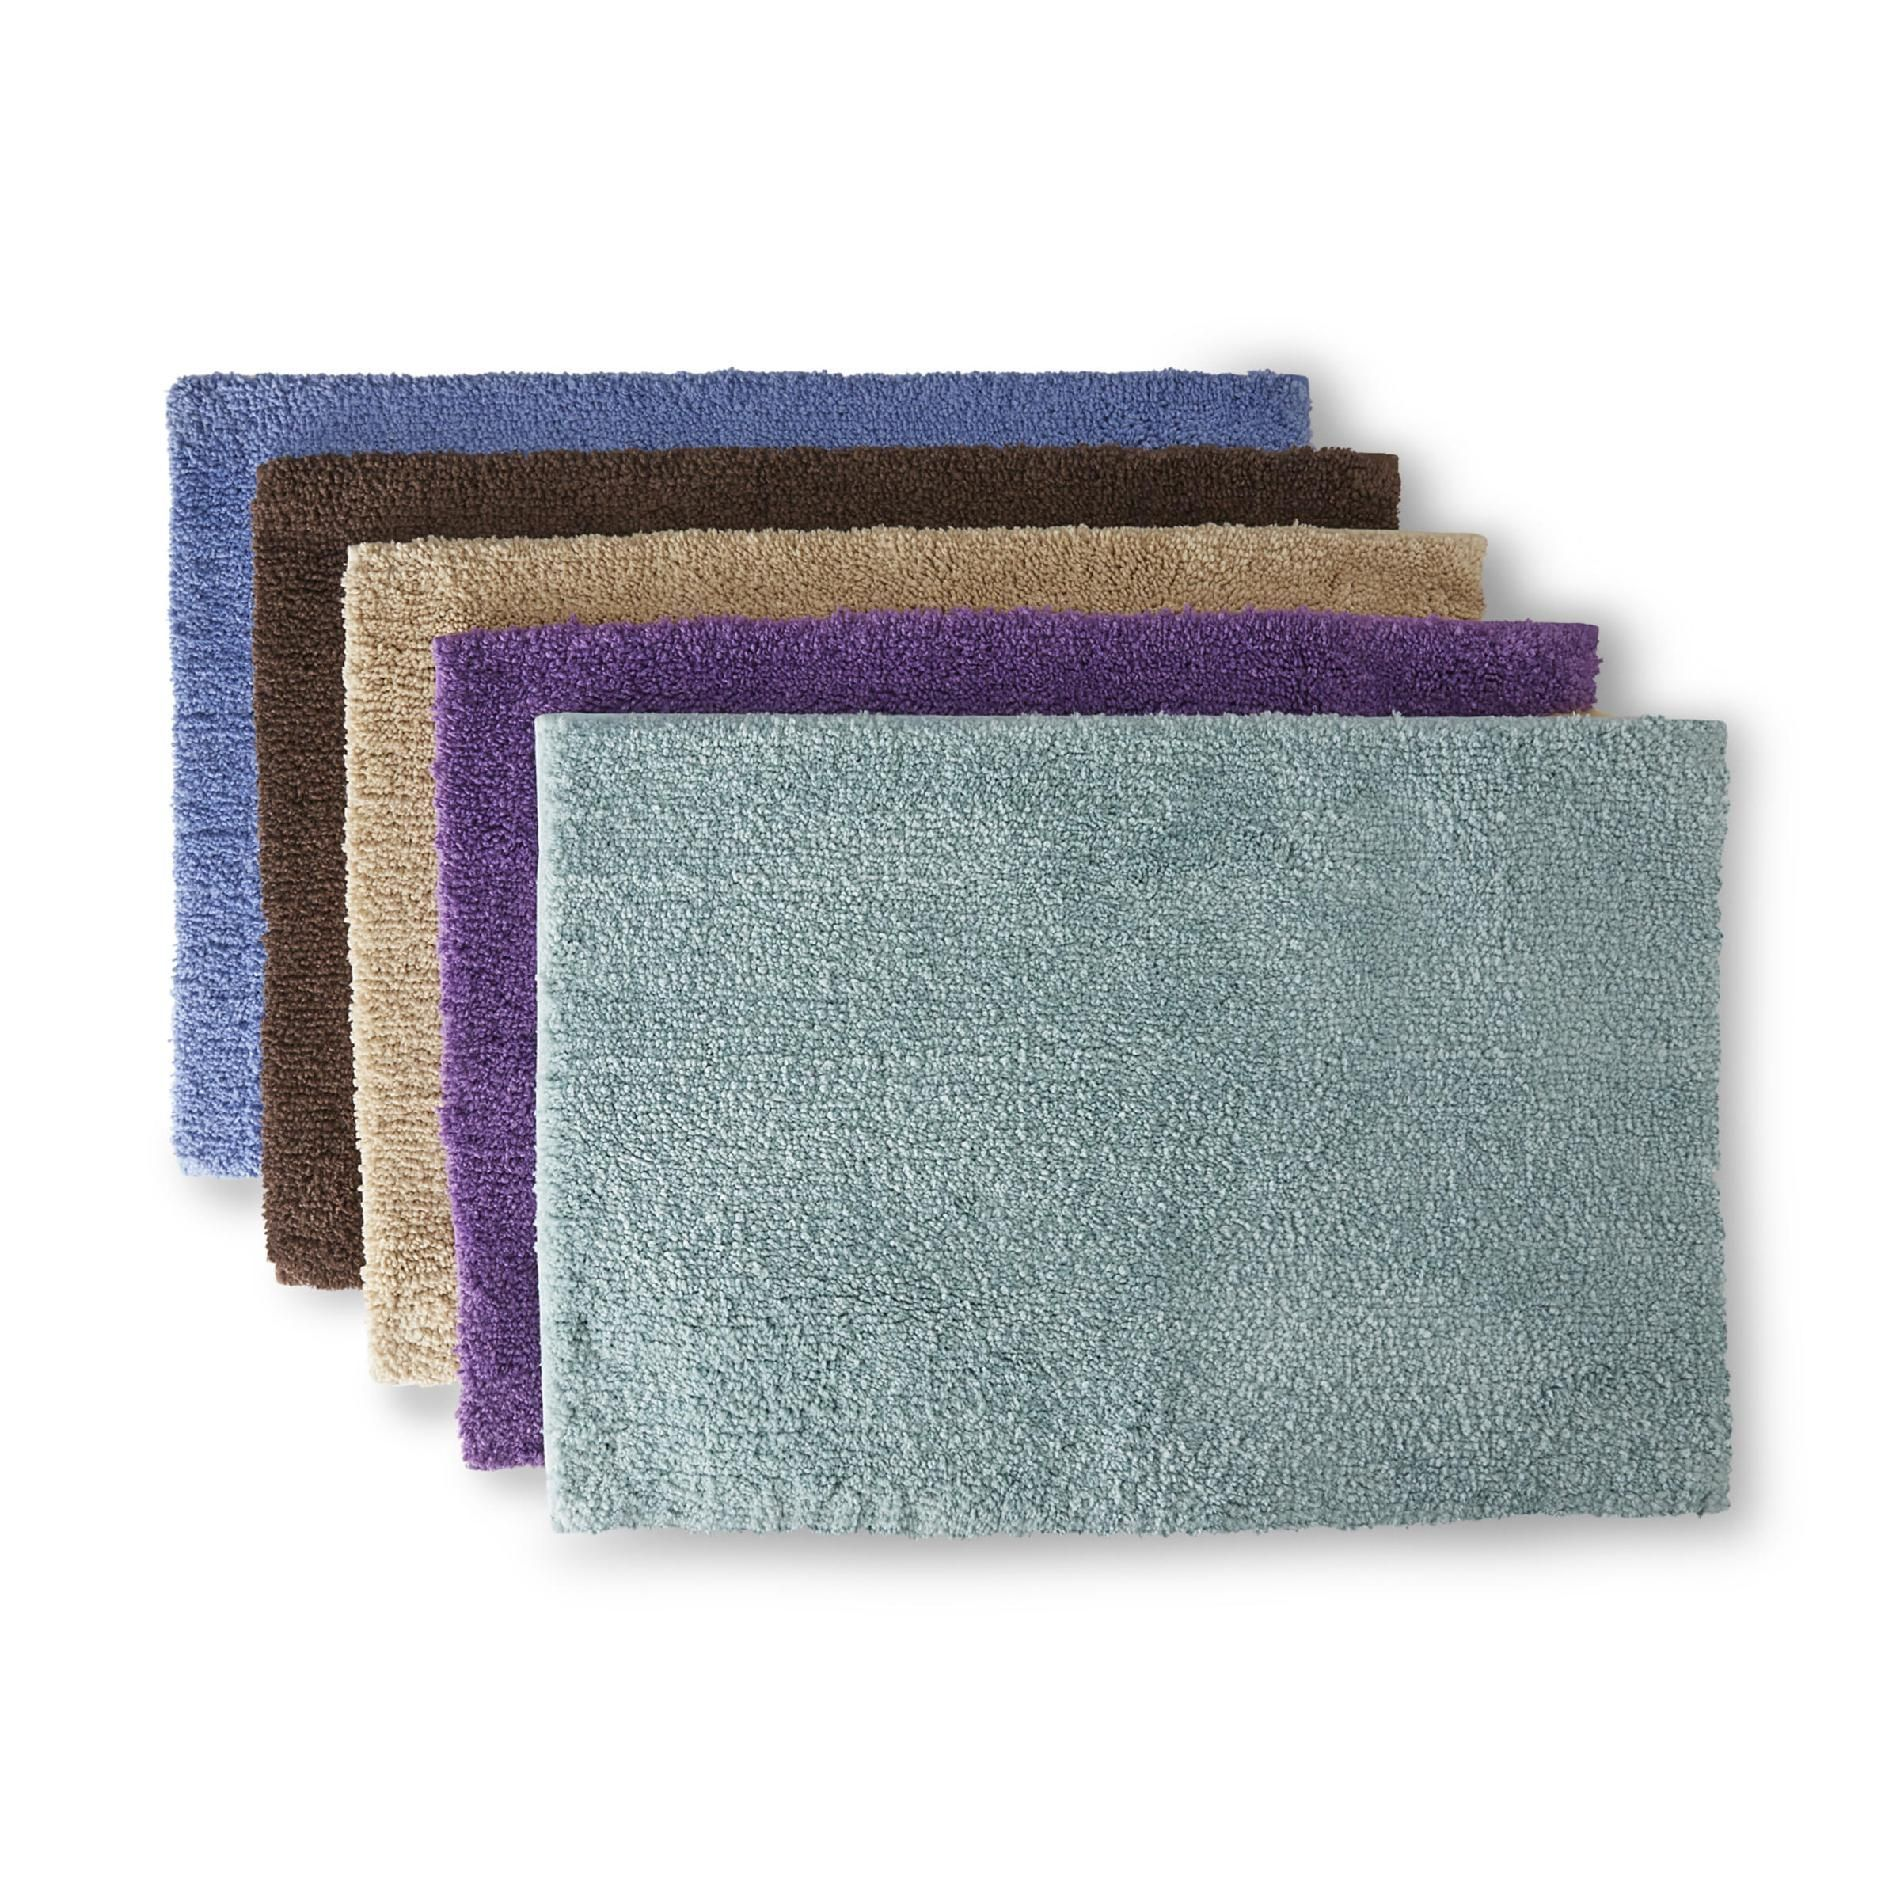 Plush Bathroom Rugs Colormate Soft Plush Microfiber Bath Rug Universal Lid Or